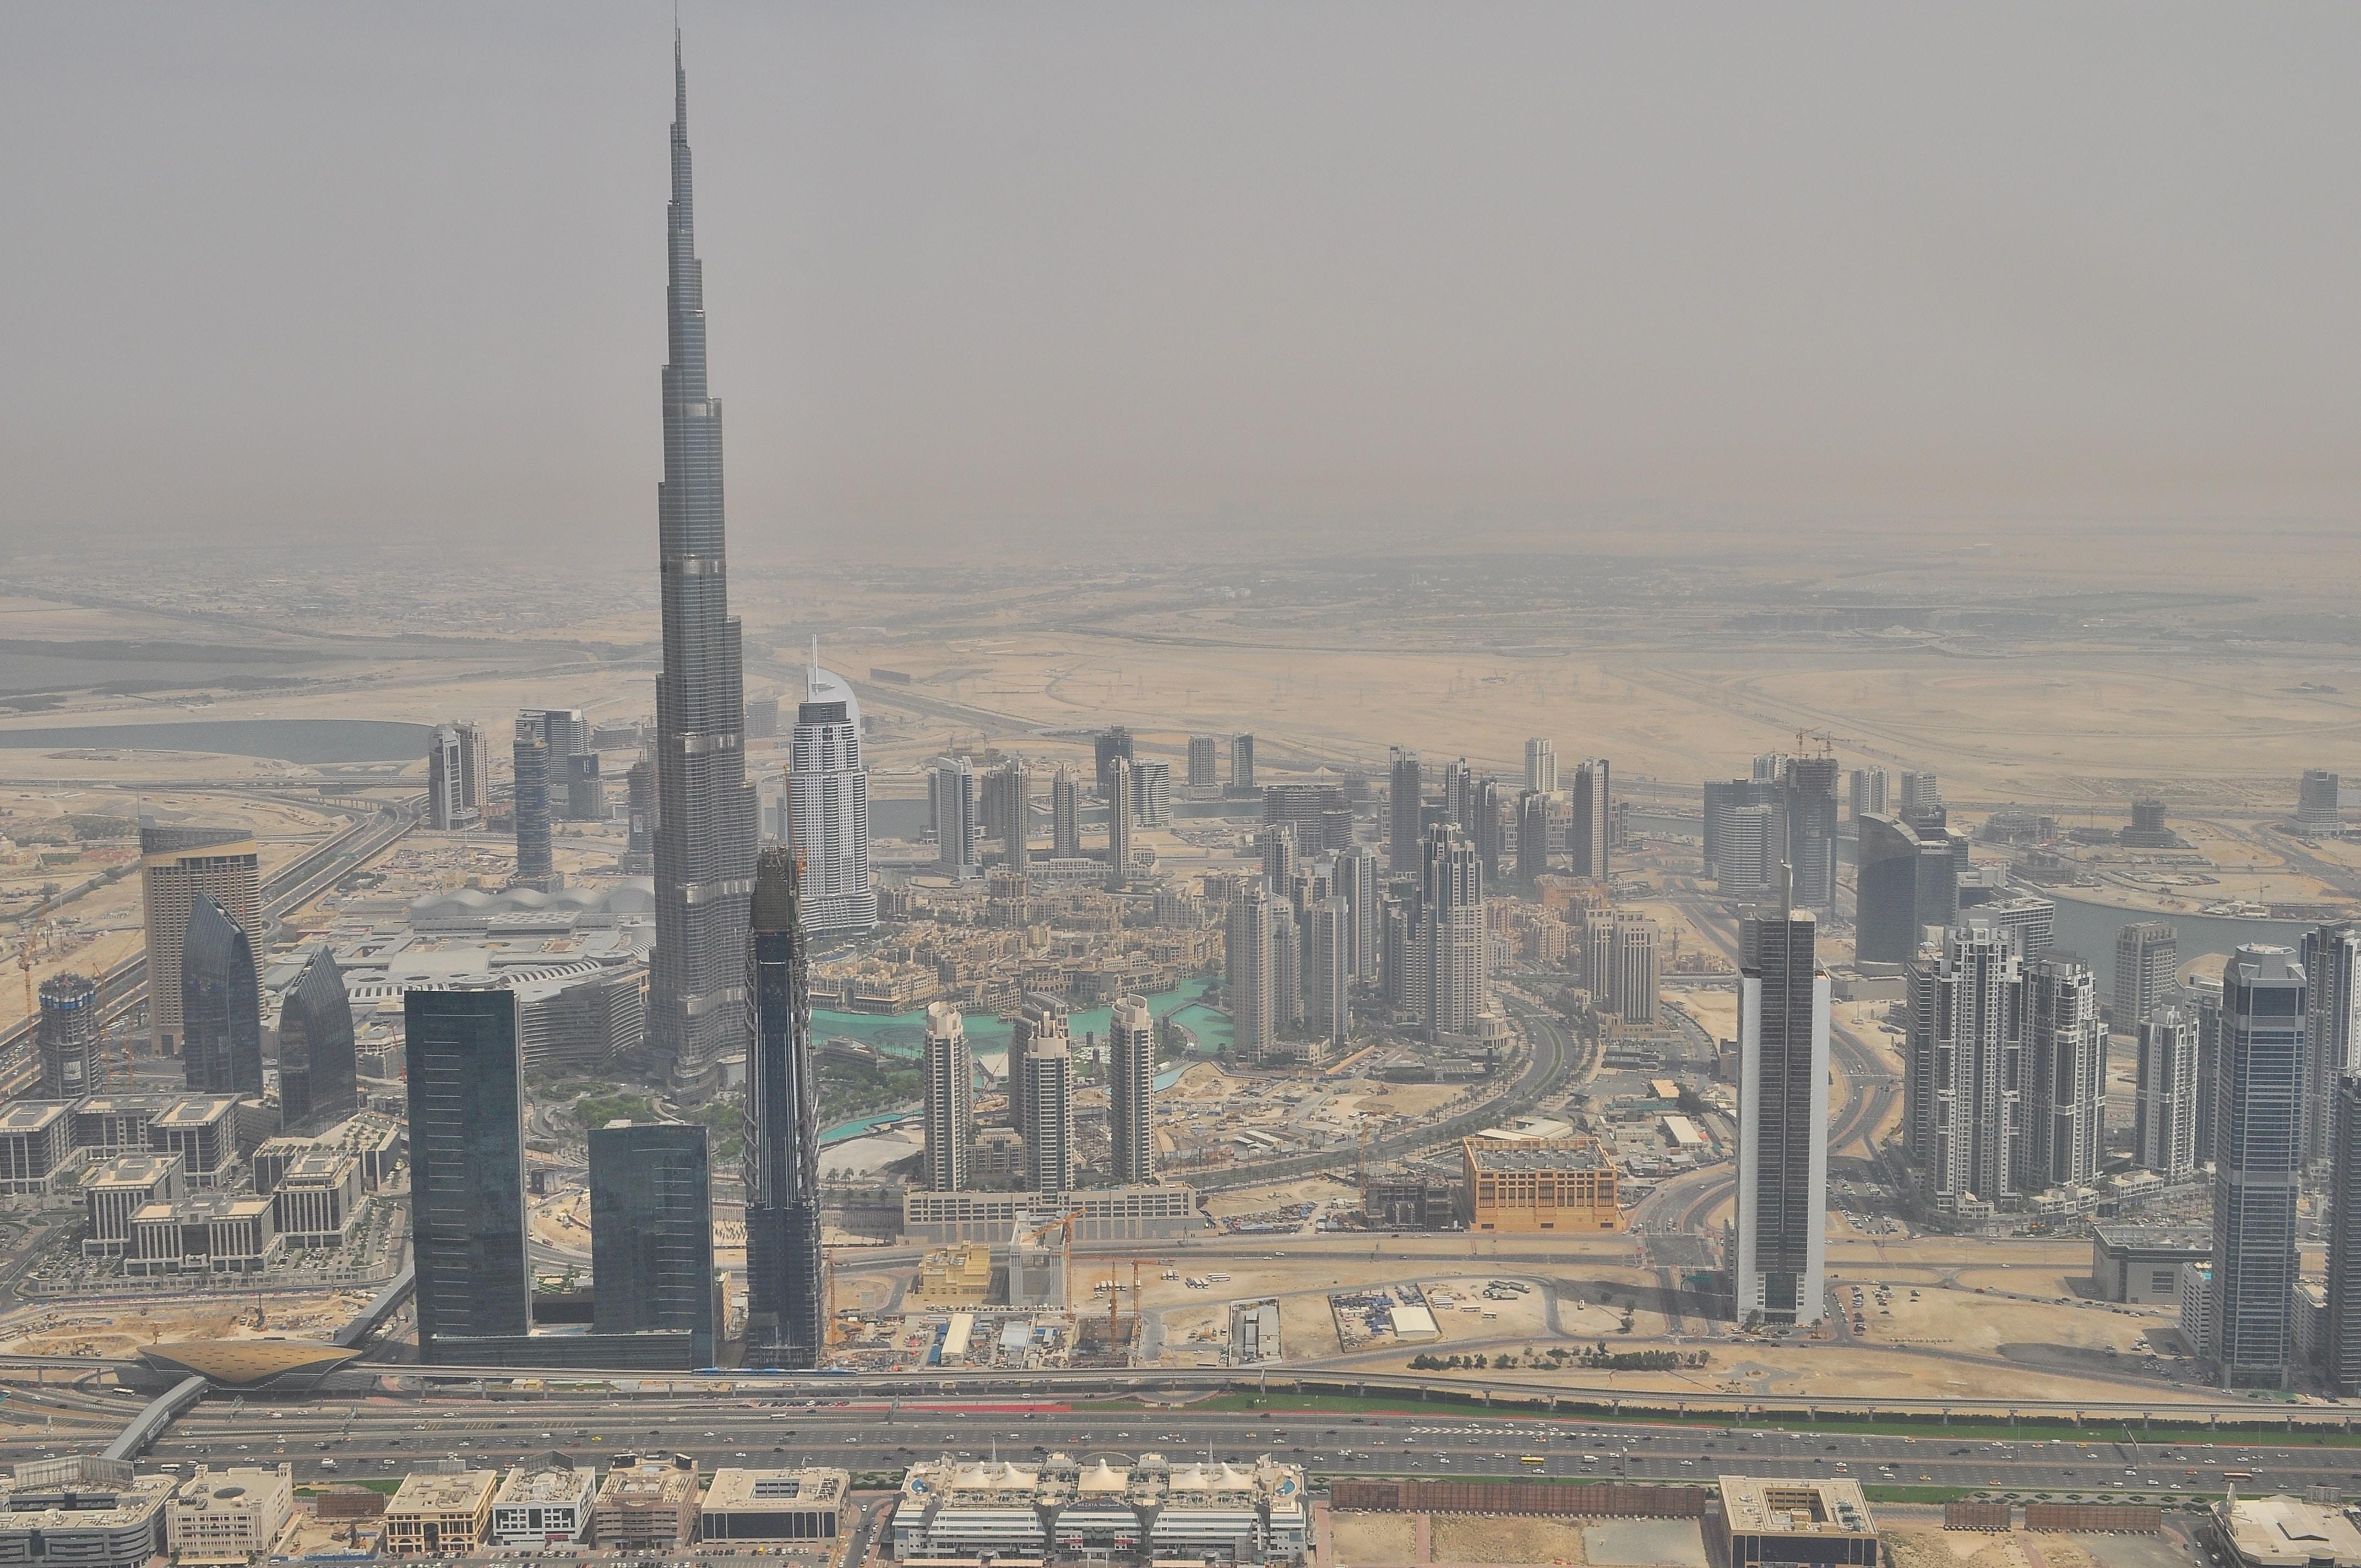 The enormous Burj Khalifa skyscraper in the skyline of Dubai